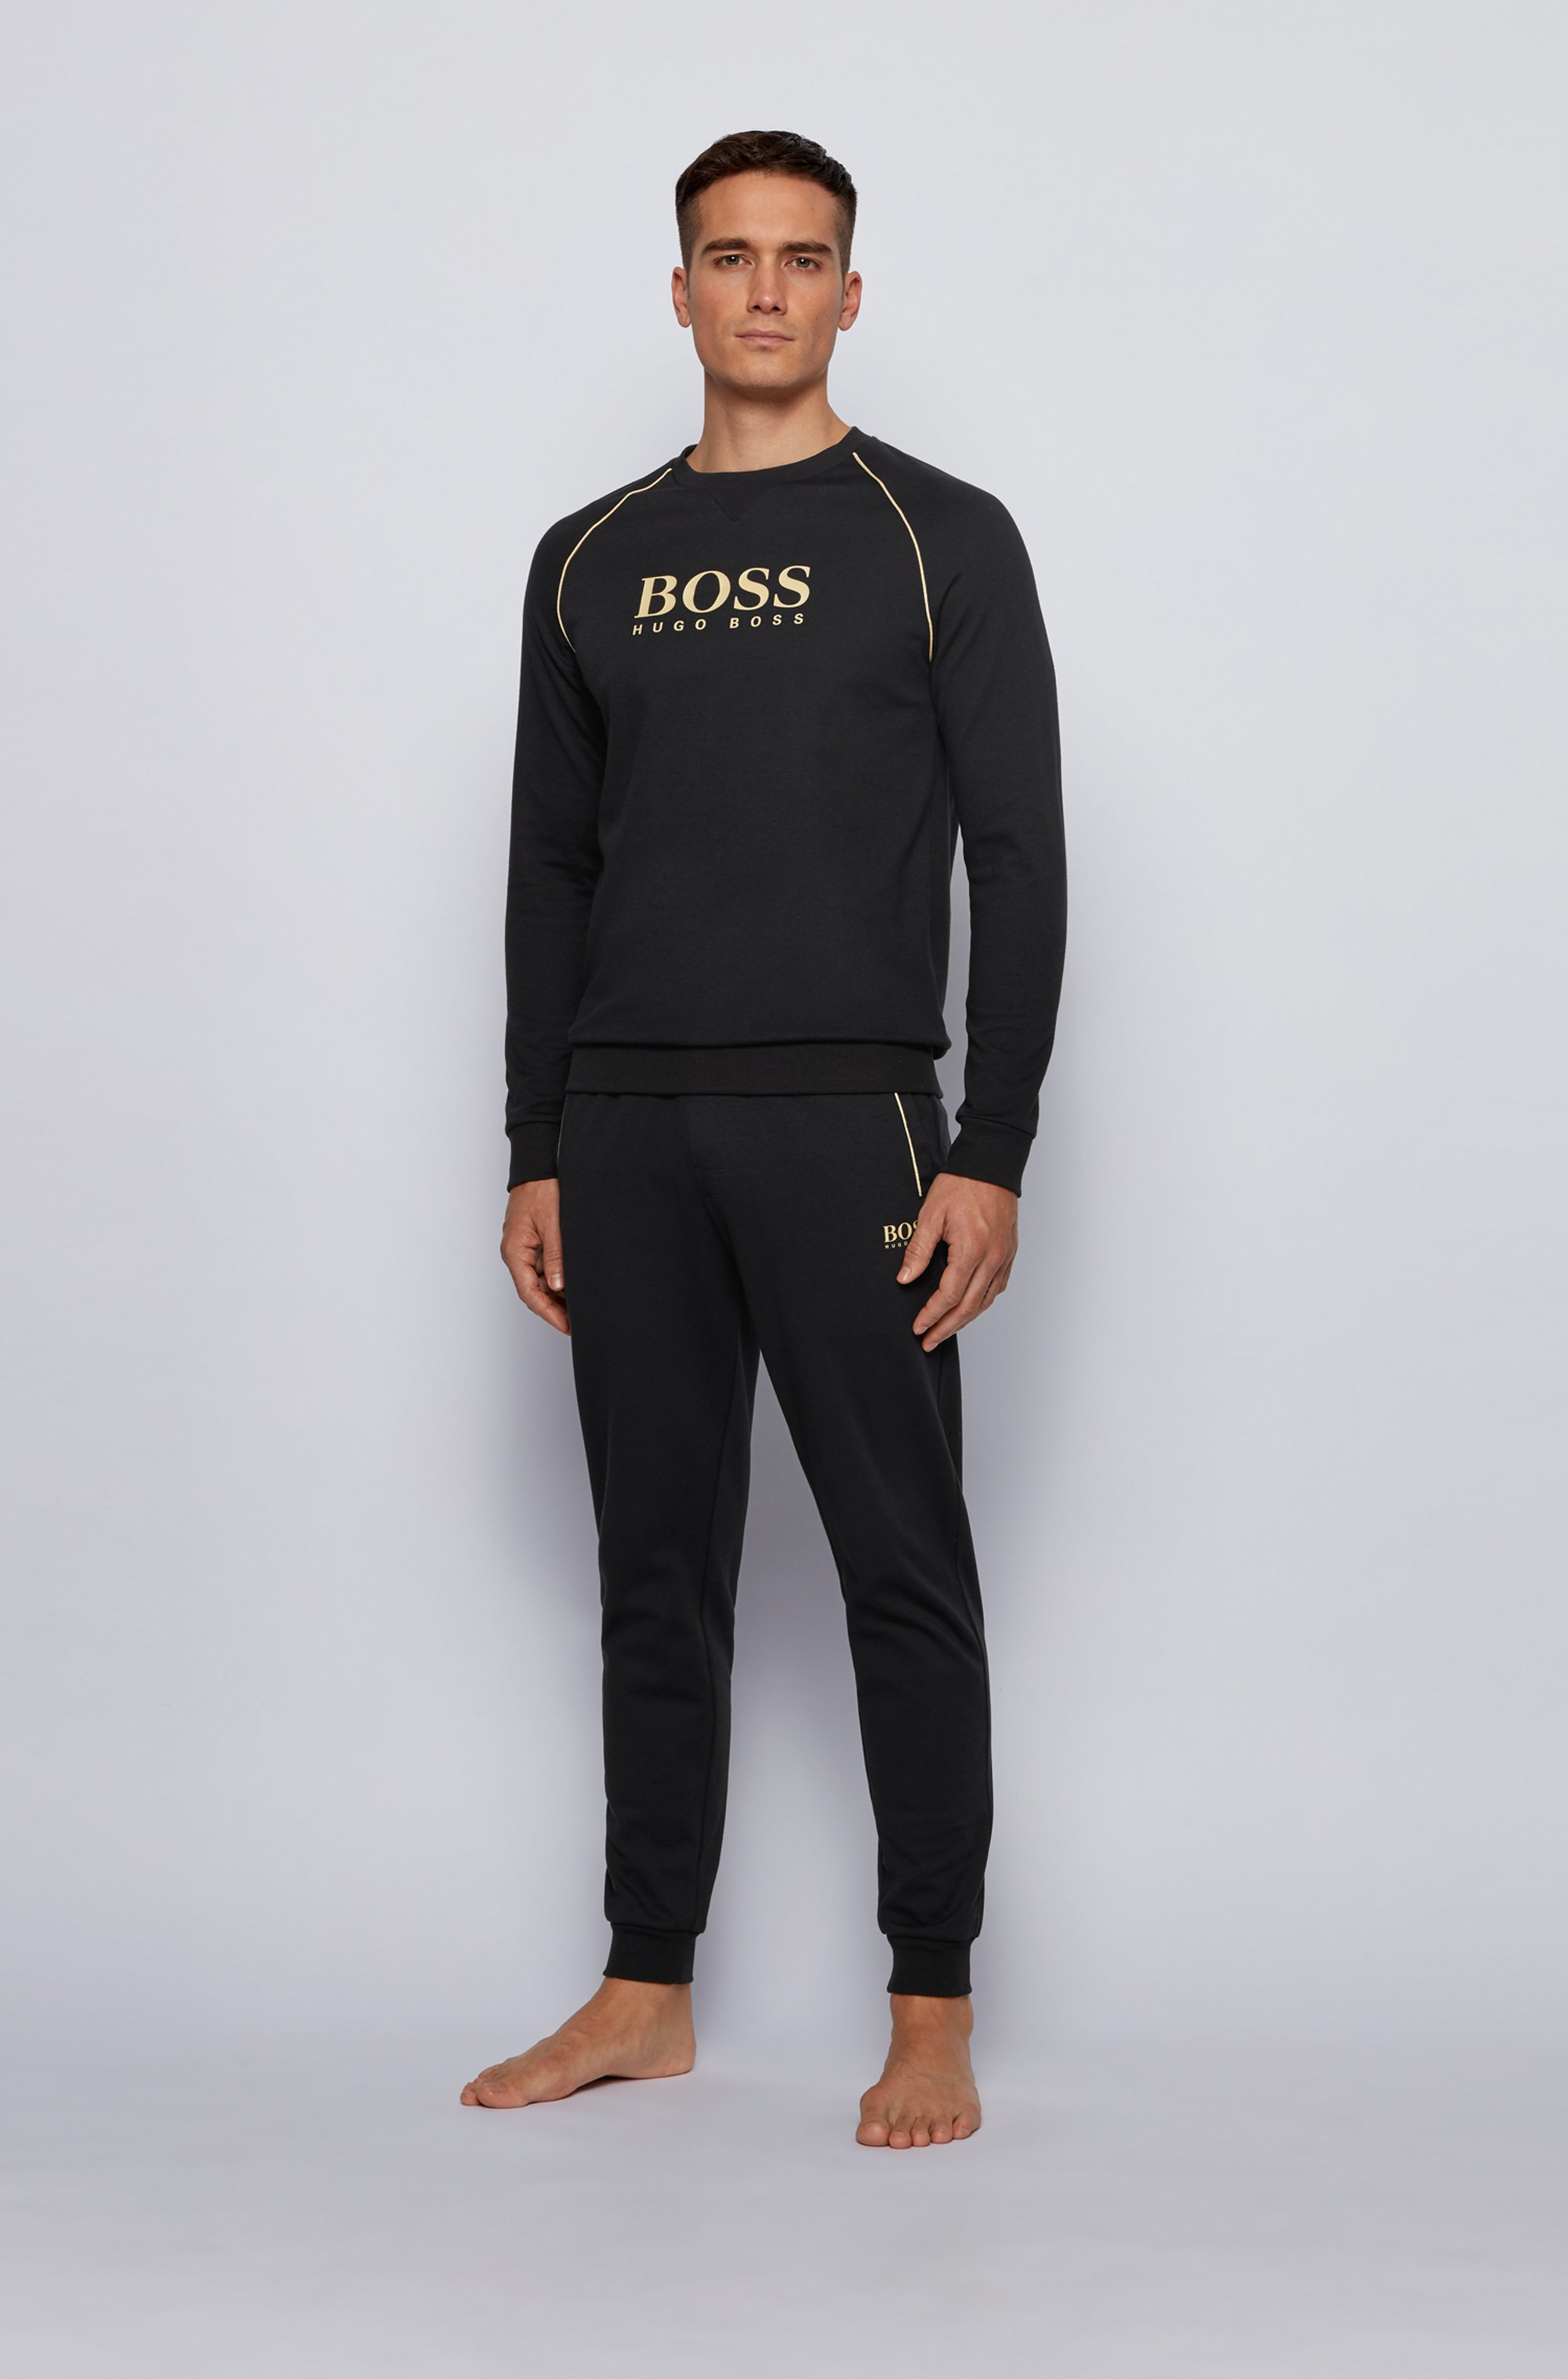 Piqué loungewear sweatshirt with metallic details